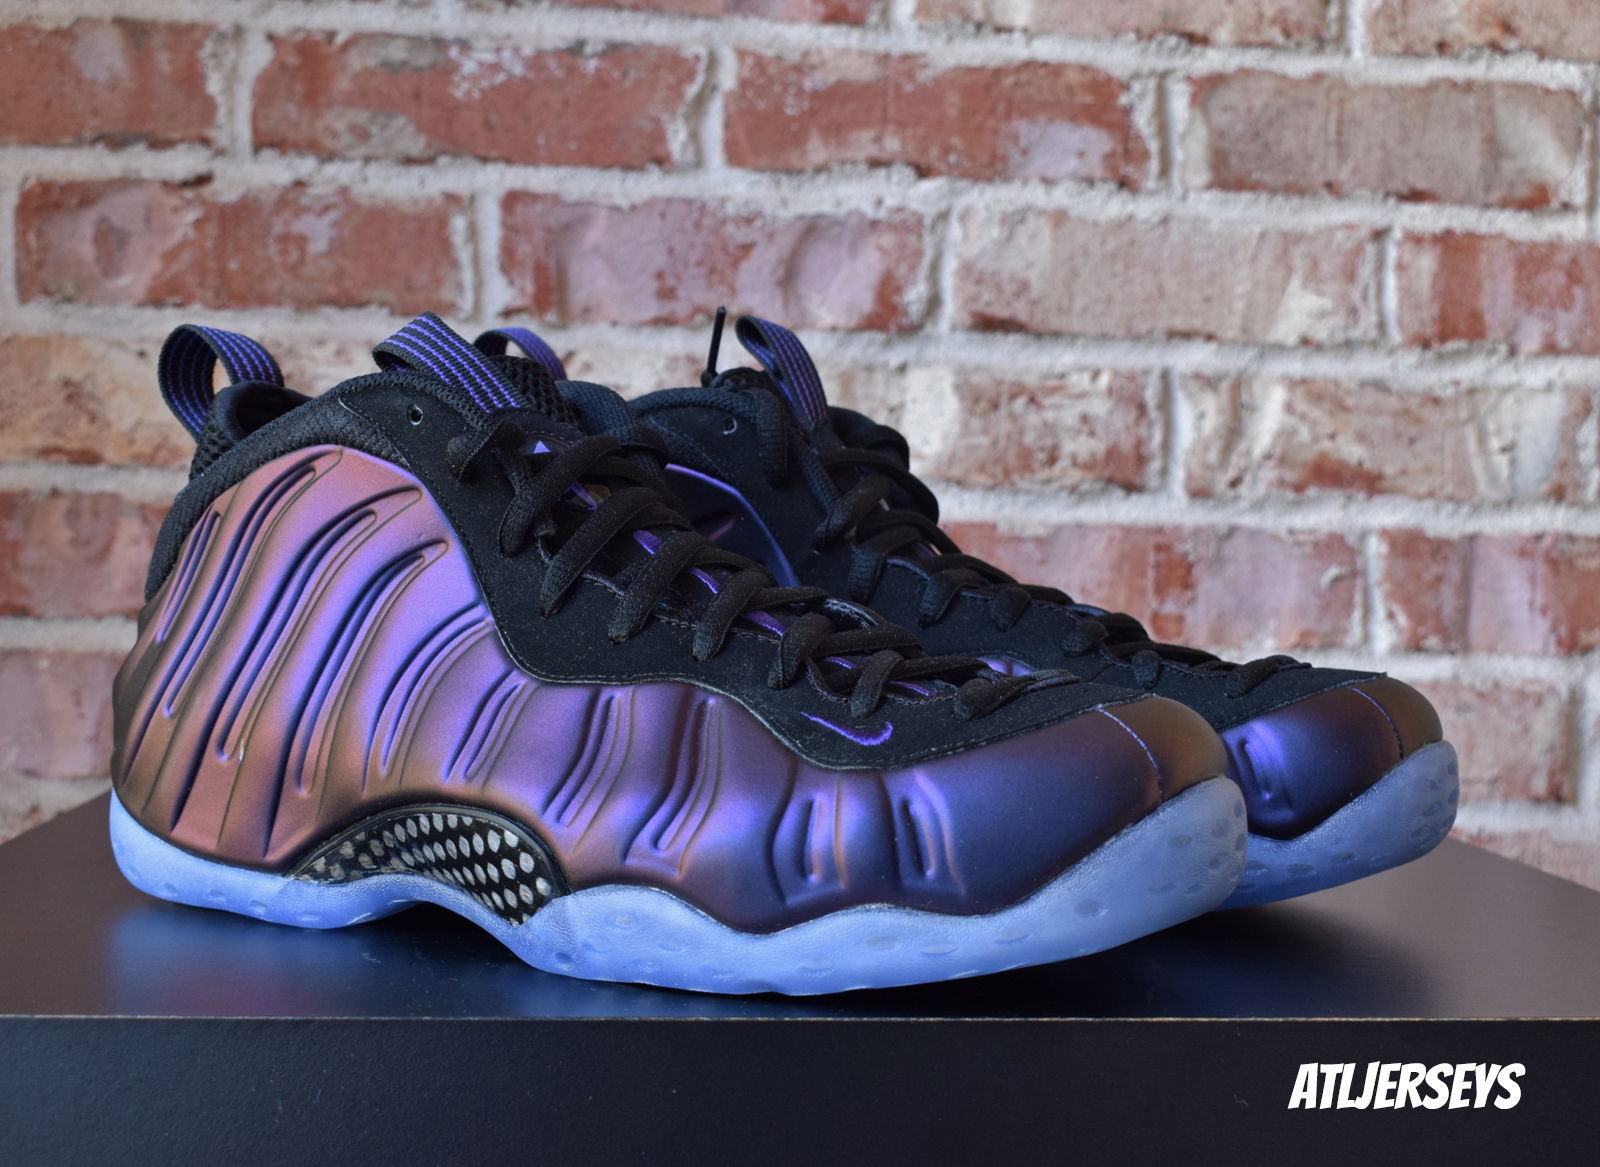 2017 Nike Air Foamposite One Eggplant Og Black Varsity Purple 314996-008